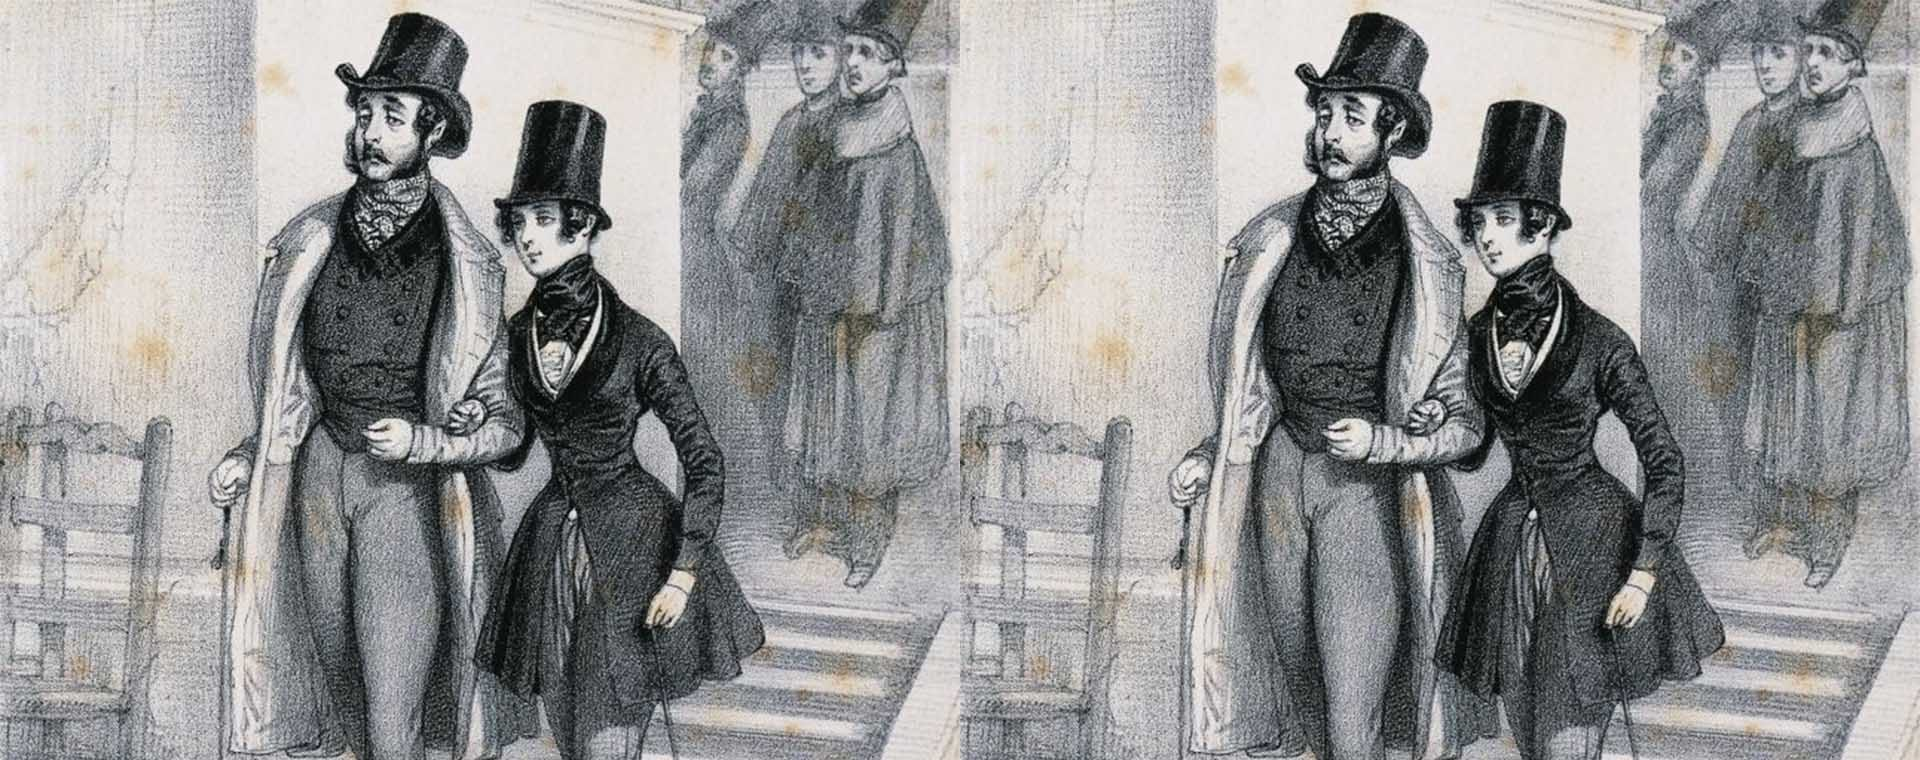 talivera-pantalon-quizz-femme-histoire